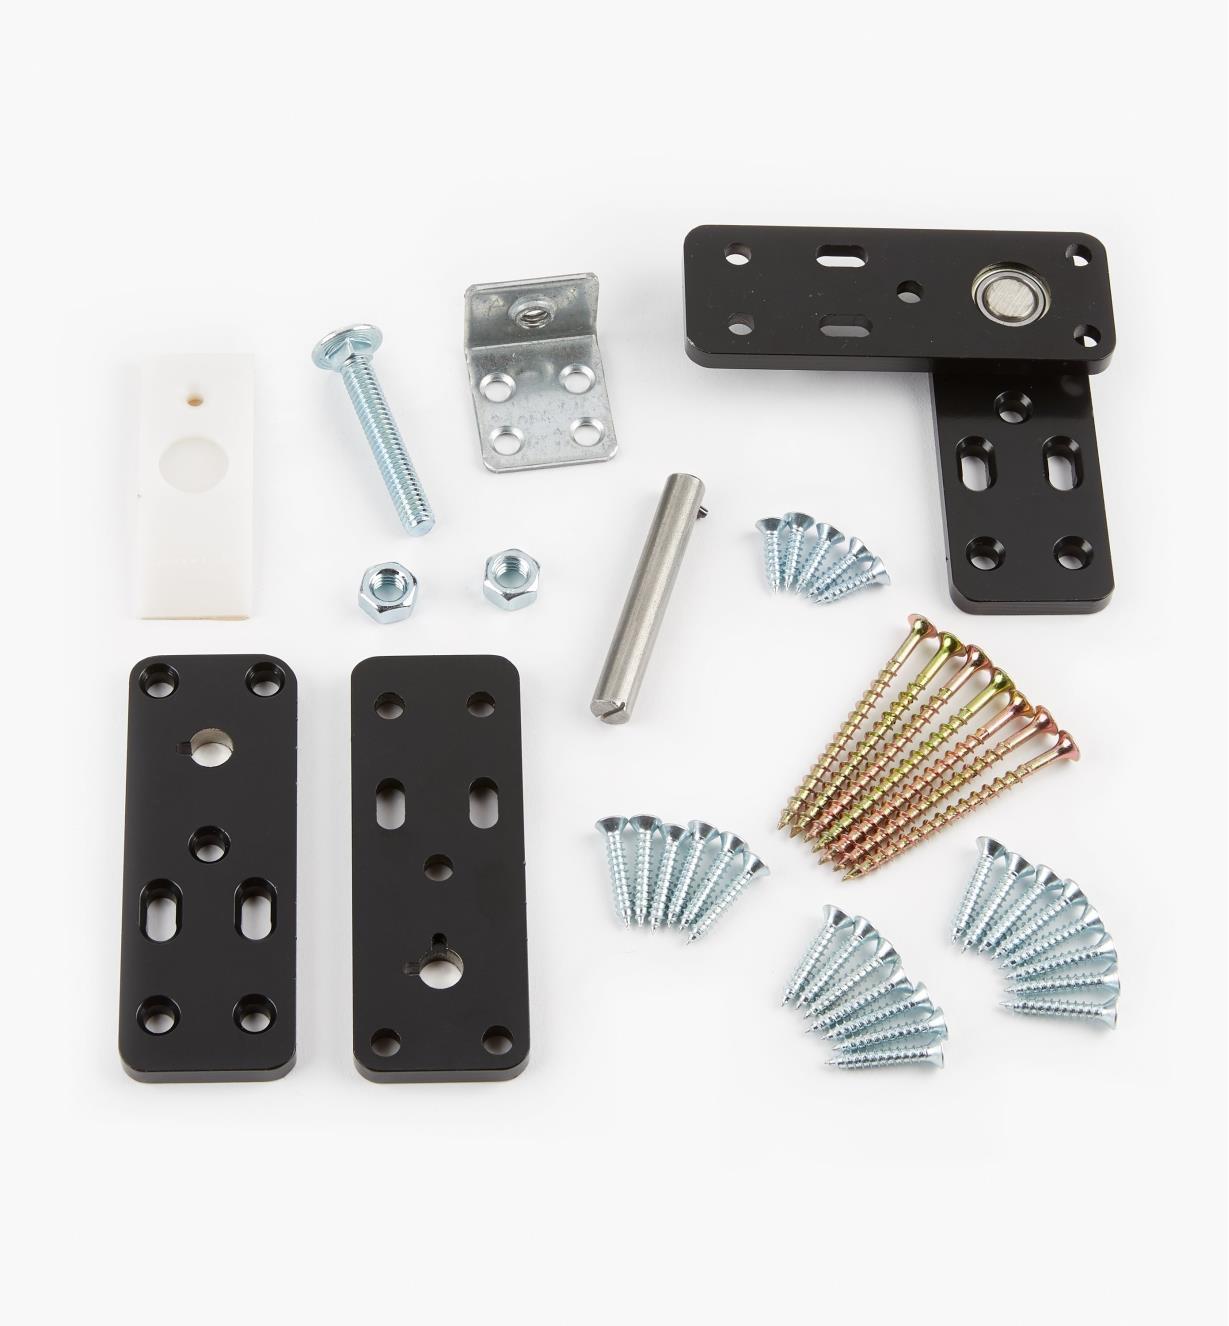 12K9351 - Flush-Mount Murphy Door Hardware Kit